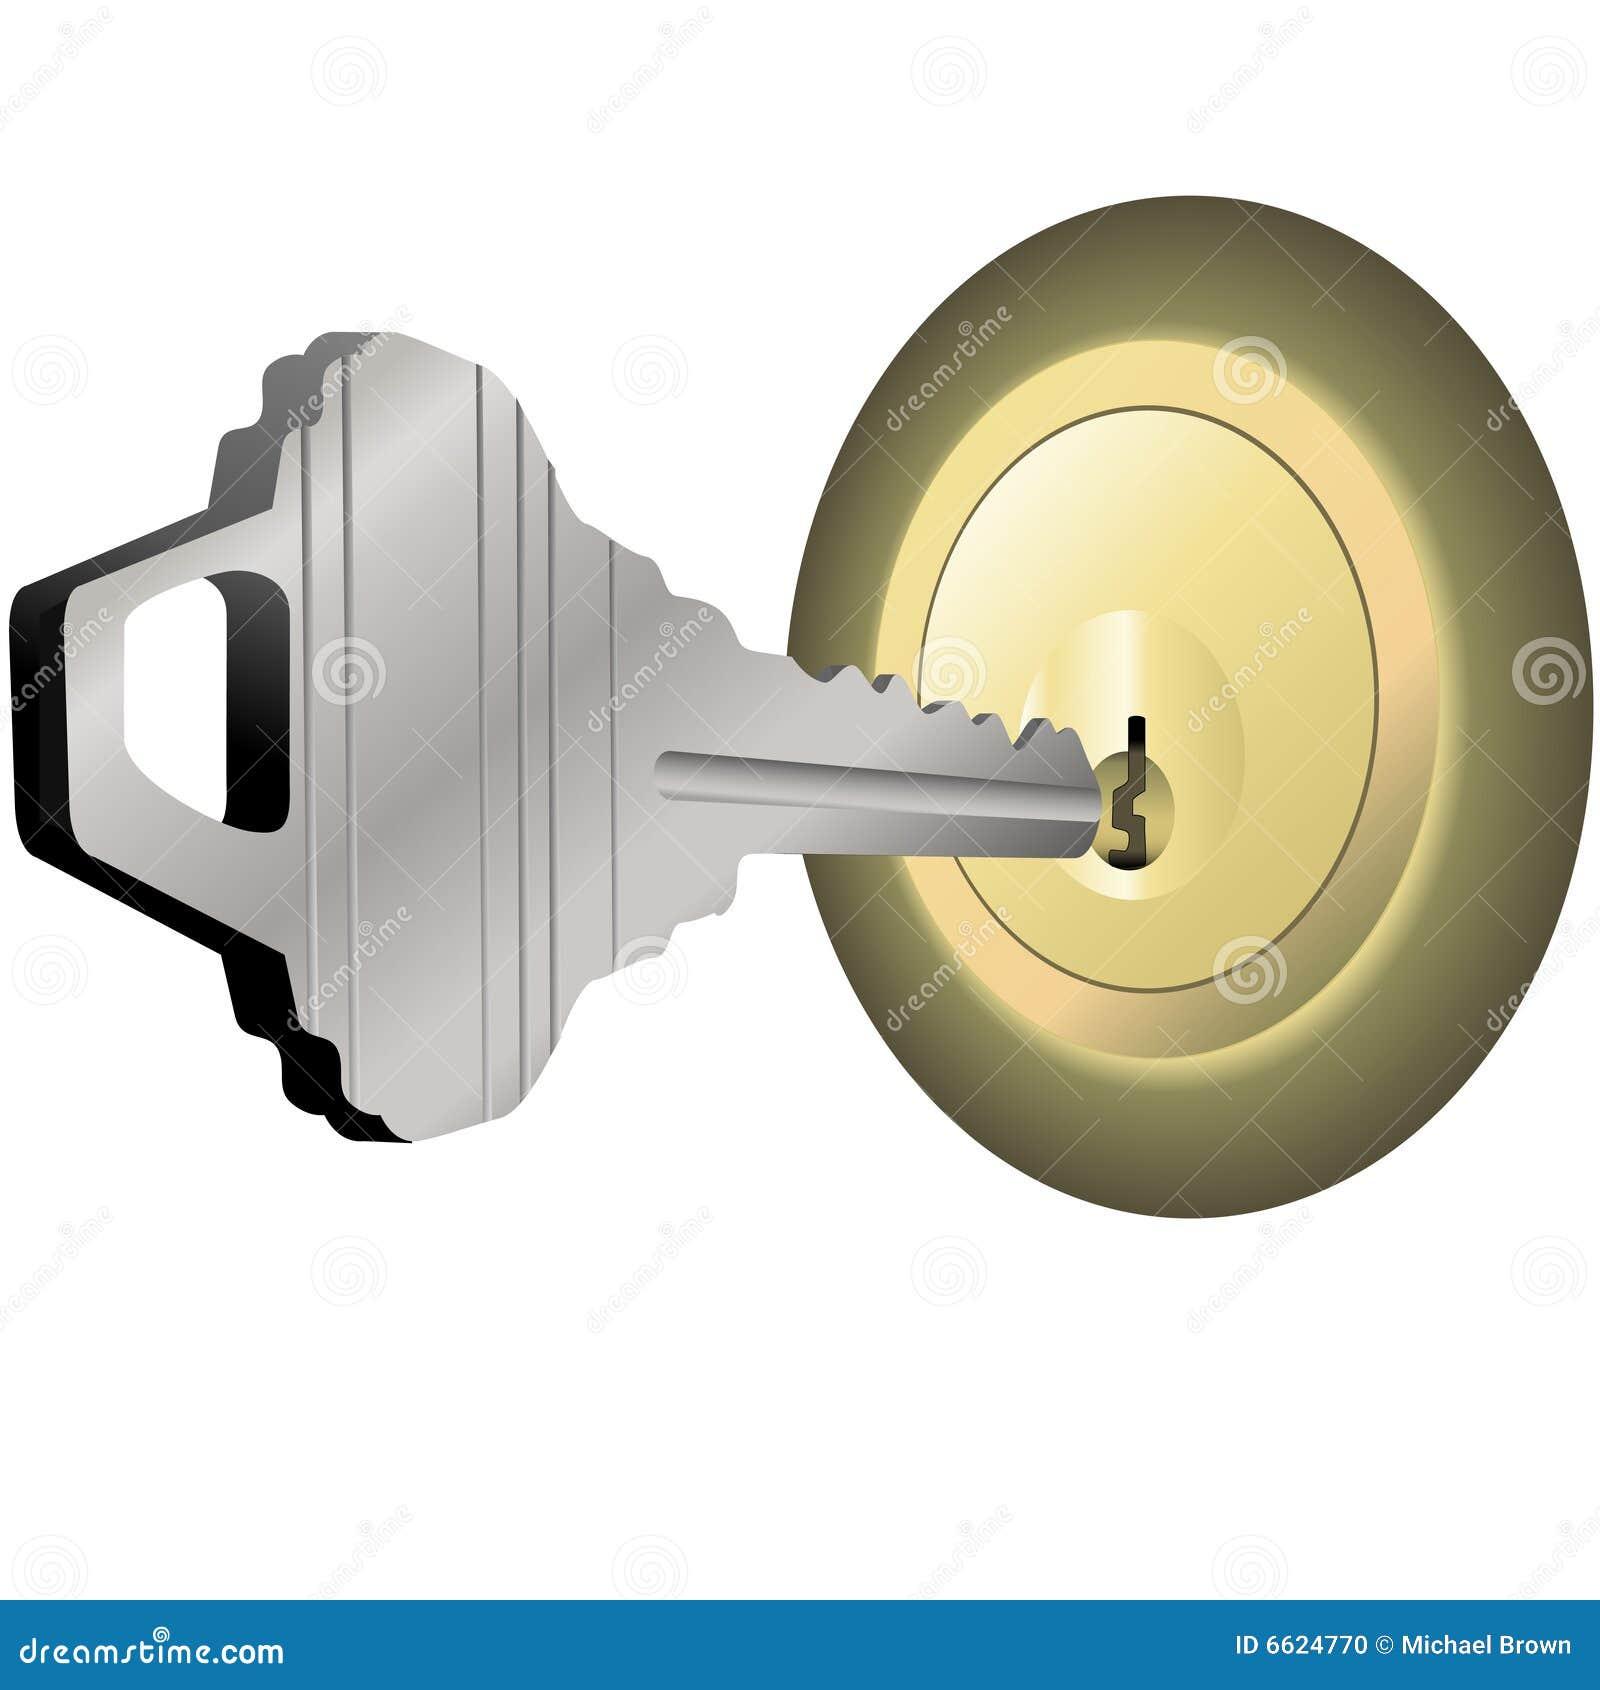 House Key To Unlock Brass Lock For Home Door Stock Photo